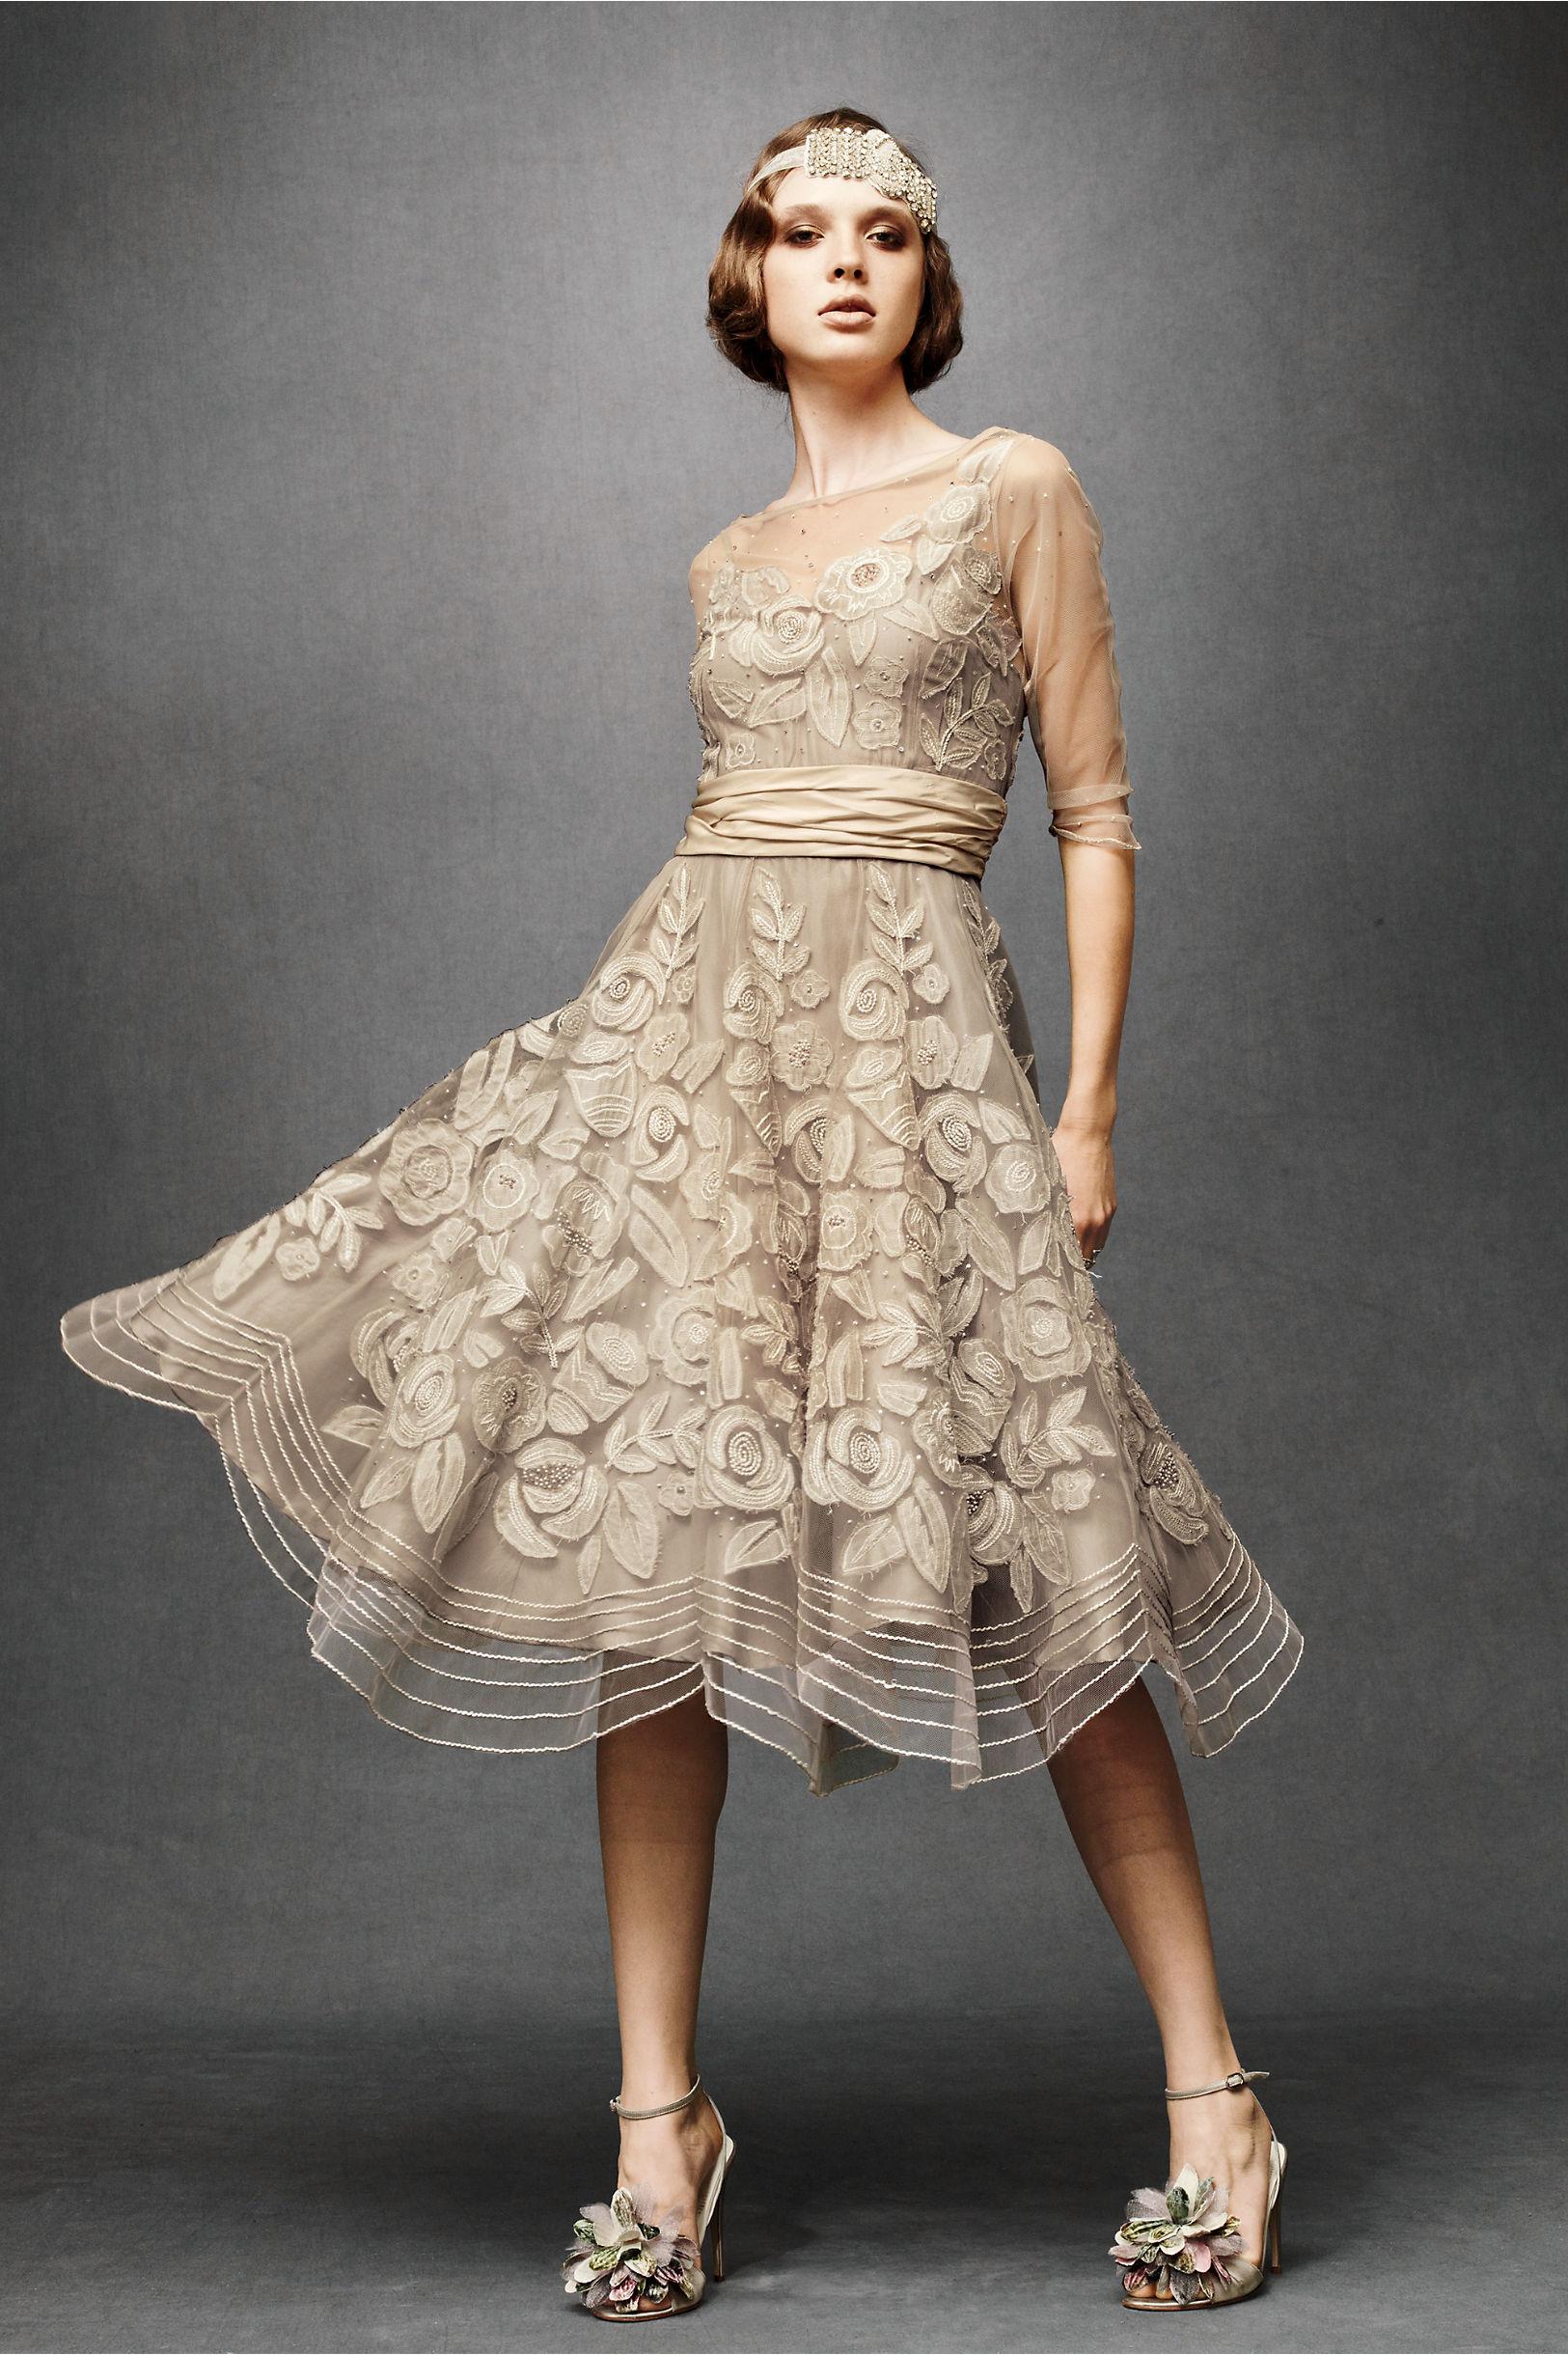 Tulle Era Dress in Bride Wedding Dresses   BHLDN